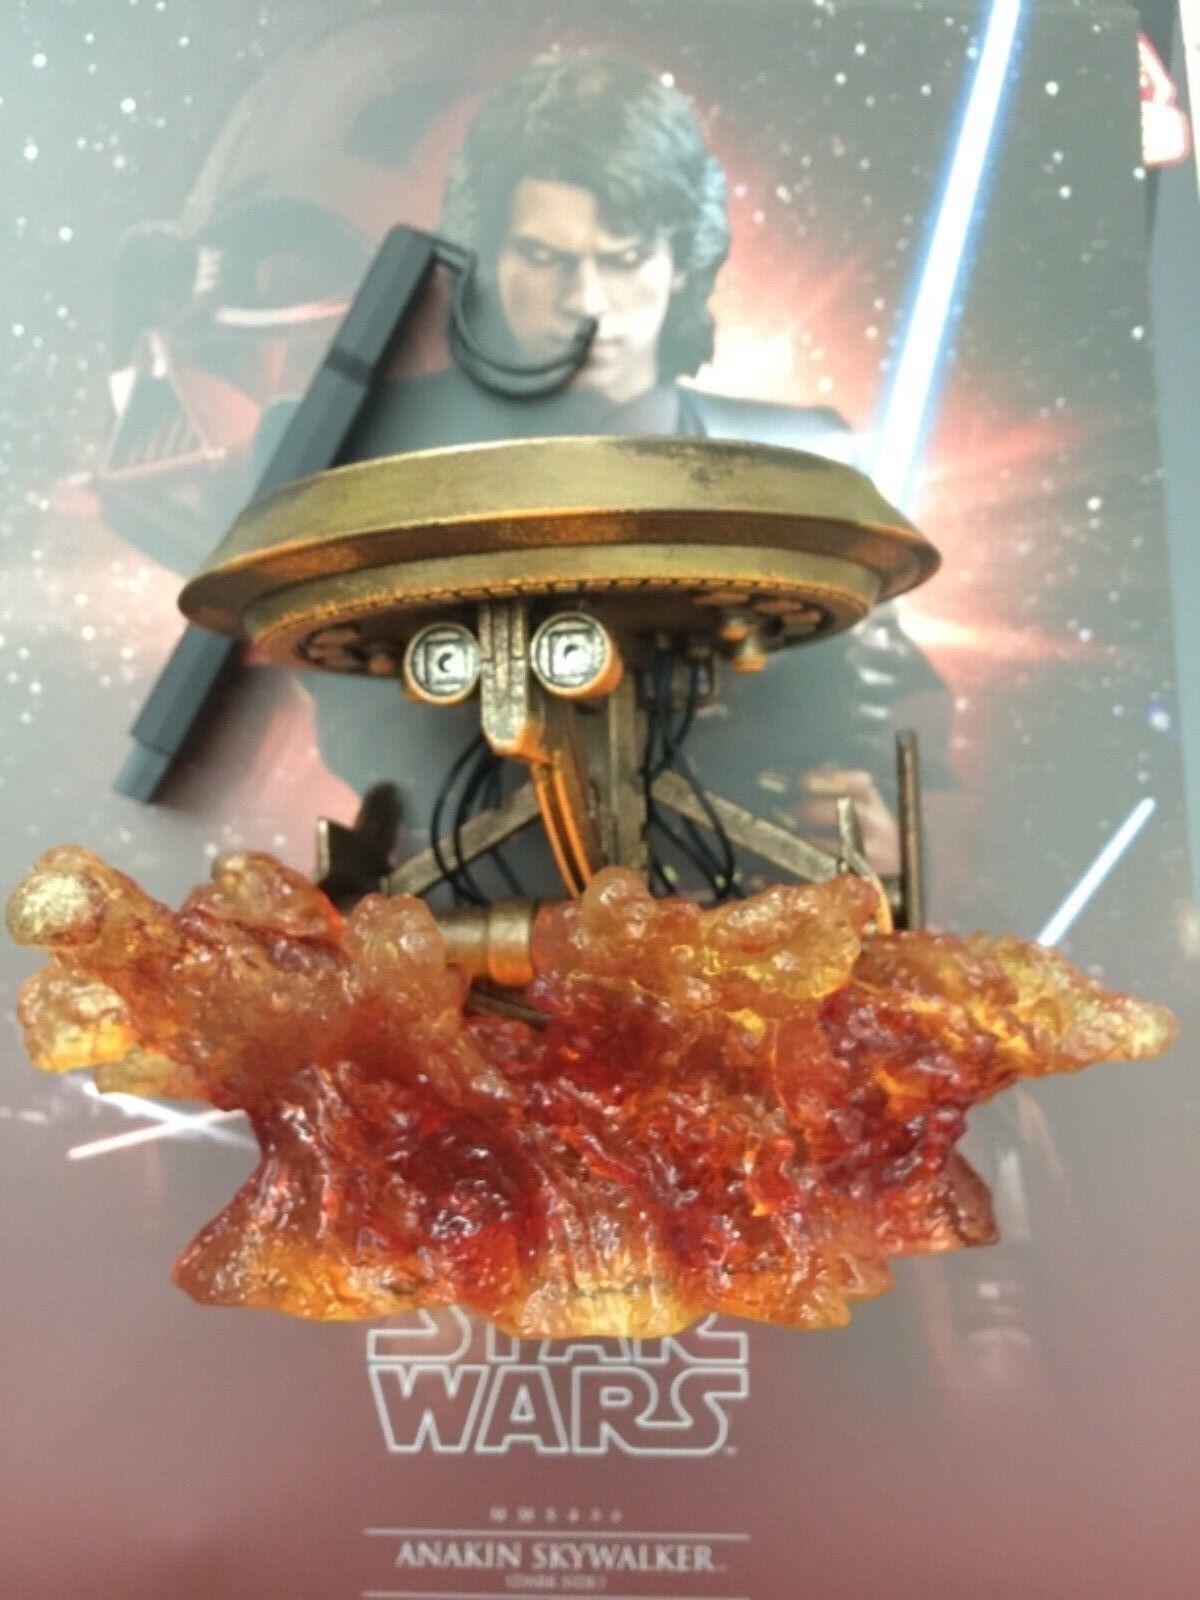 Calientegiocattoli estrella guerras  Anakin  cielowalker ( Dark Side) MMS486 - LED droid PLATFORM SET  forniamo il meglio